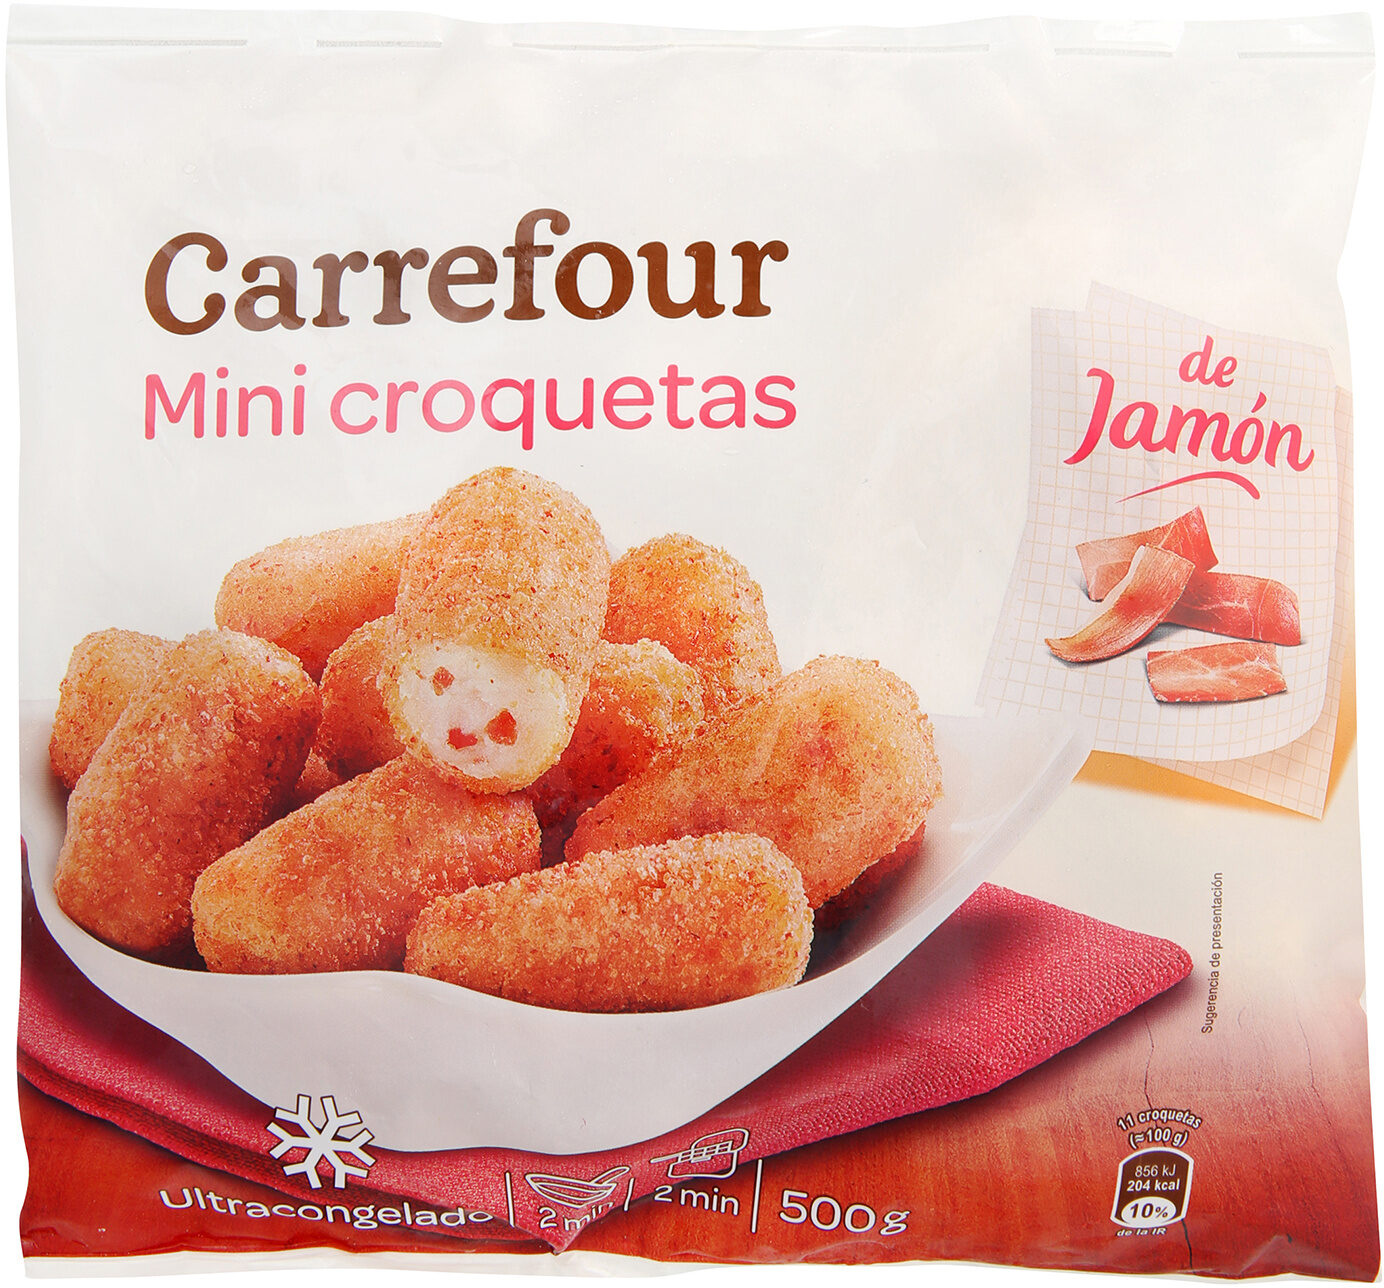 Mini croquetas de jamón - Producte - es